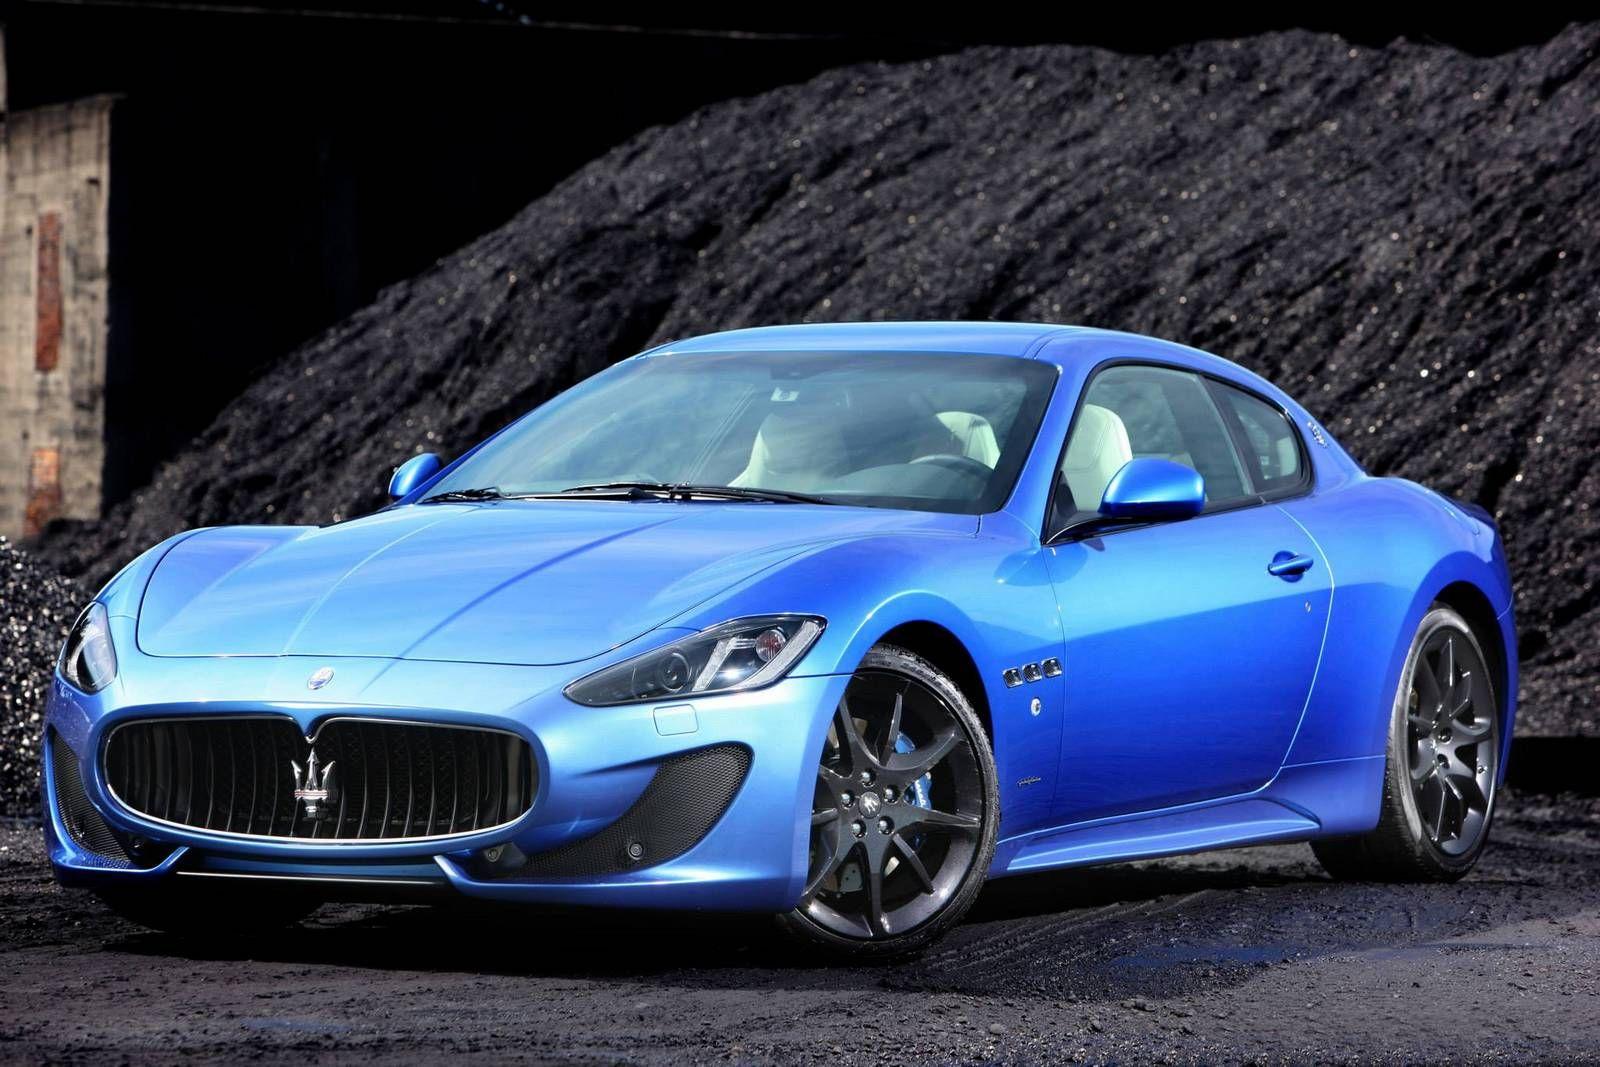 Gallery Blue Maserati GranTurismo Sport on the Road (With